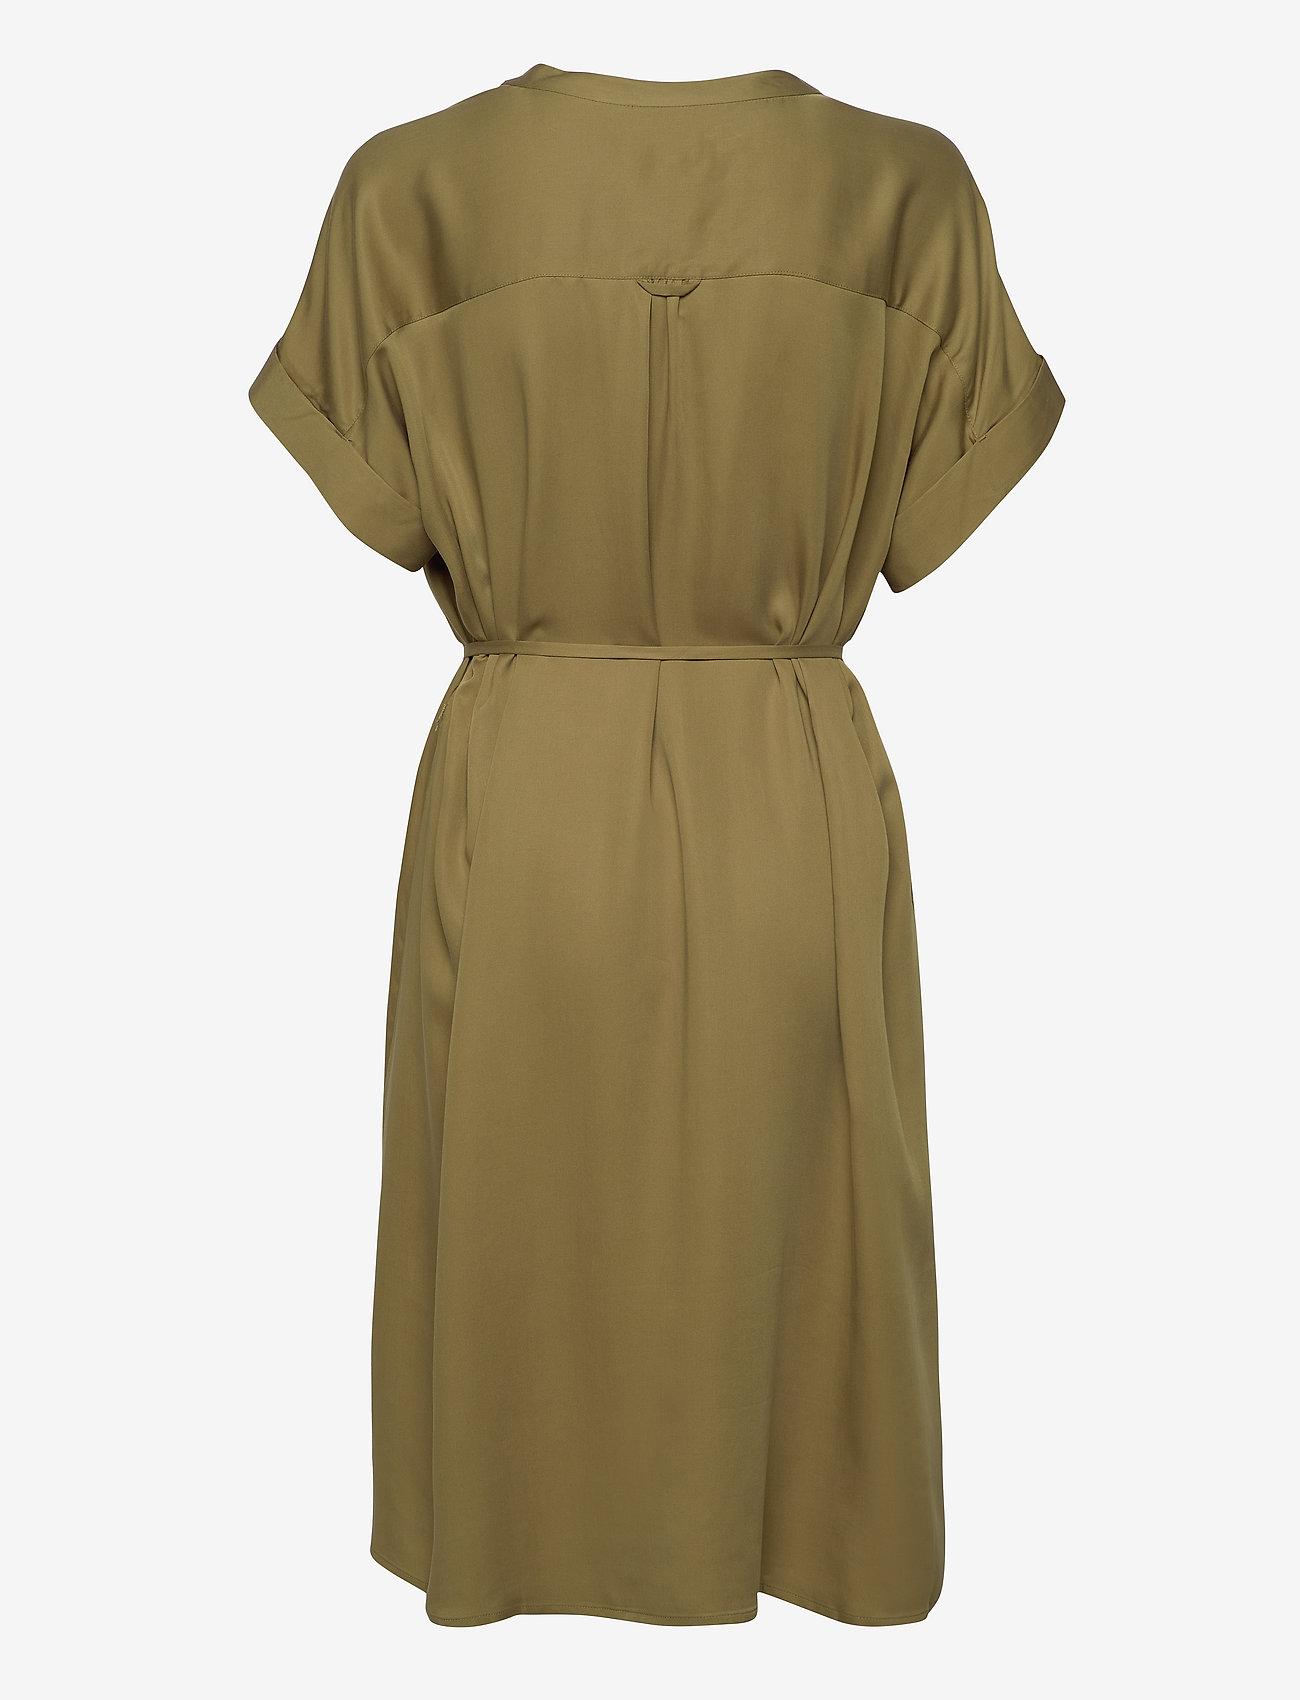 GANT - D1. FLUID DRESS - midi dresses - olive green - 1